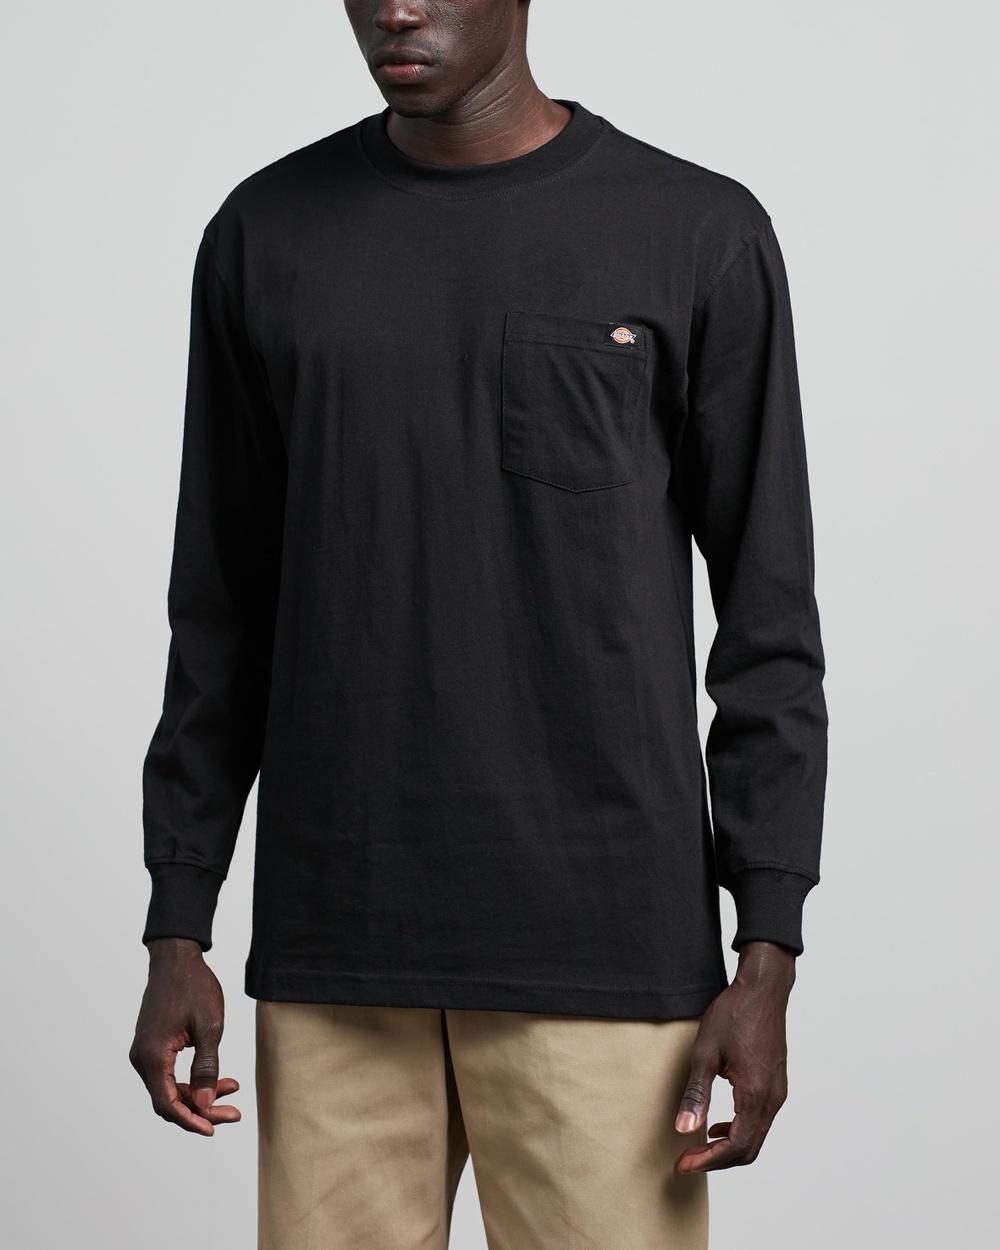 Dickies - Heavy Long Sleeve Tee - T-Shirts & Singlets (Black) Heavy Long Sleeve Tee